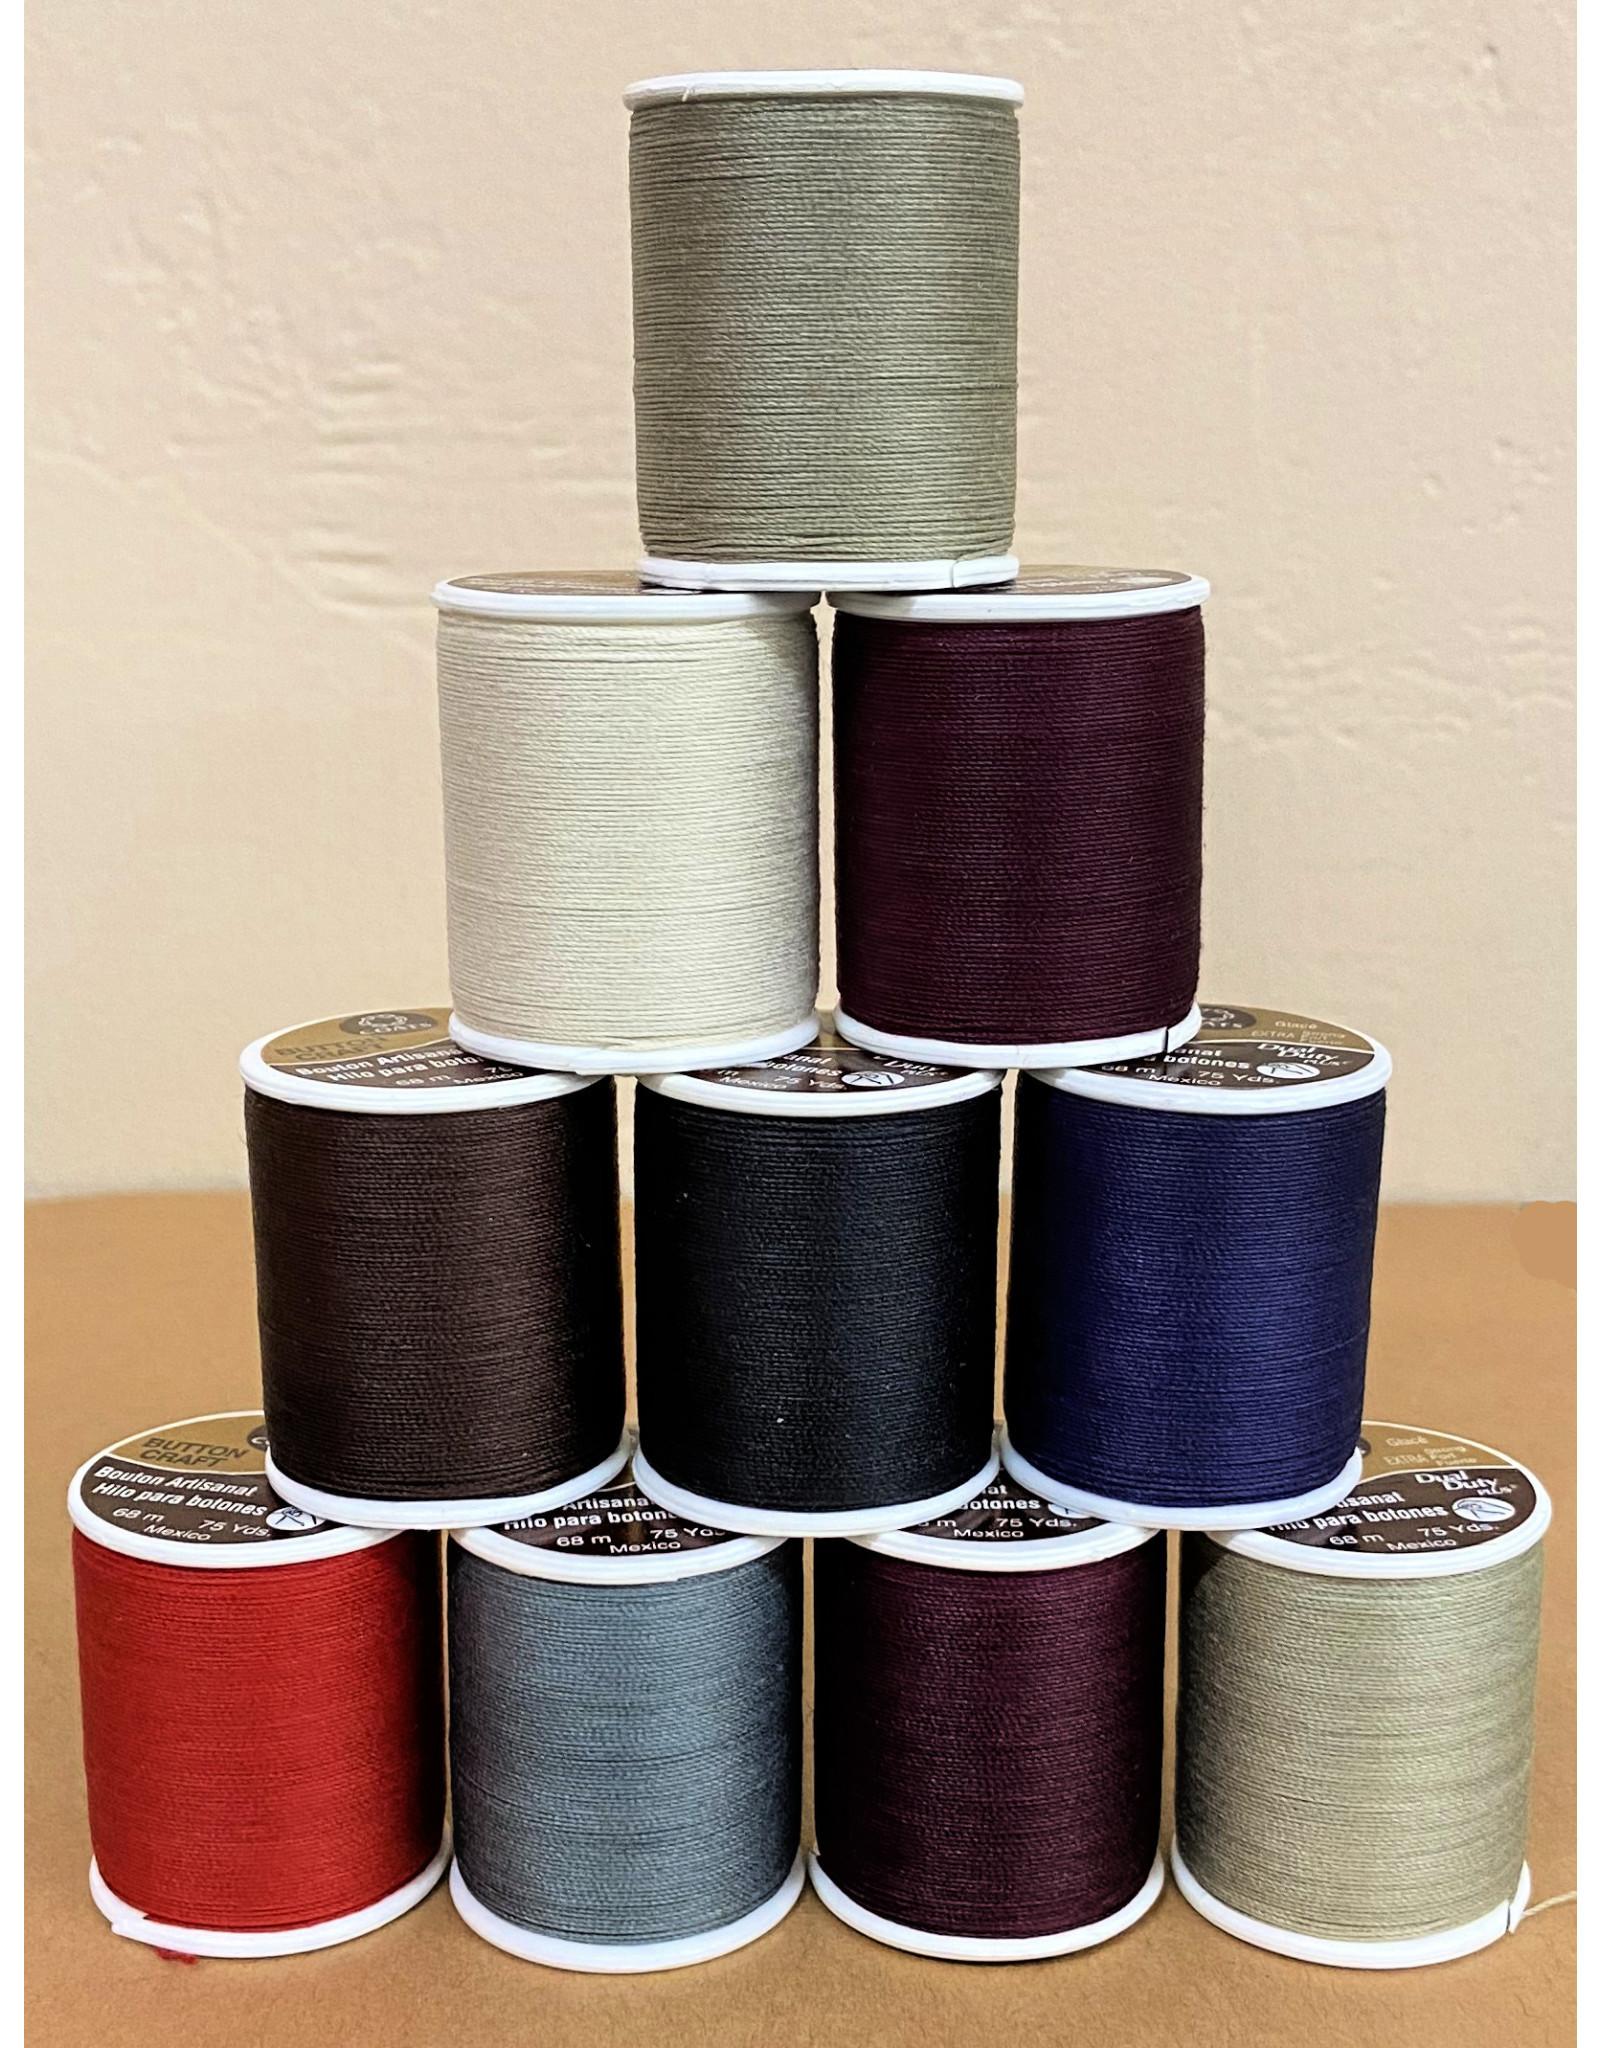 Coats & Clark Button Craft Thread, Dual Duty Plus, Color: Navy